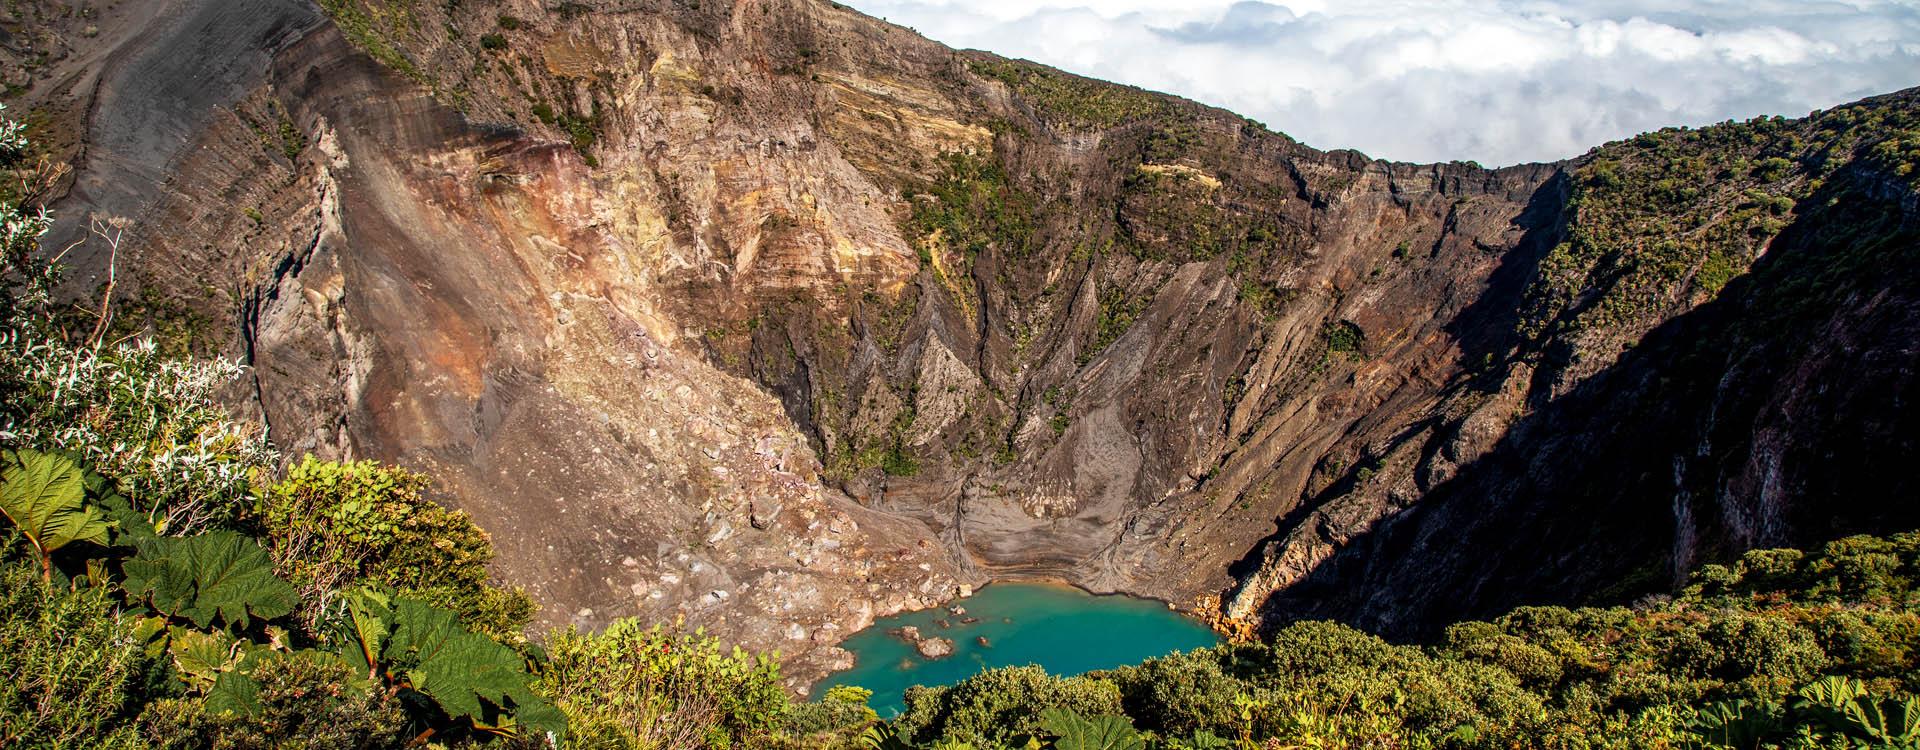 Volcano Irazu in Central Valley Costa Rica